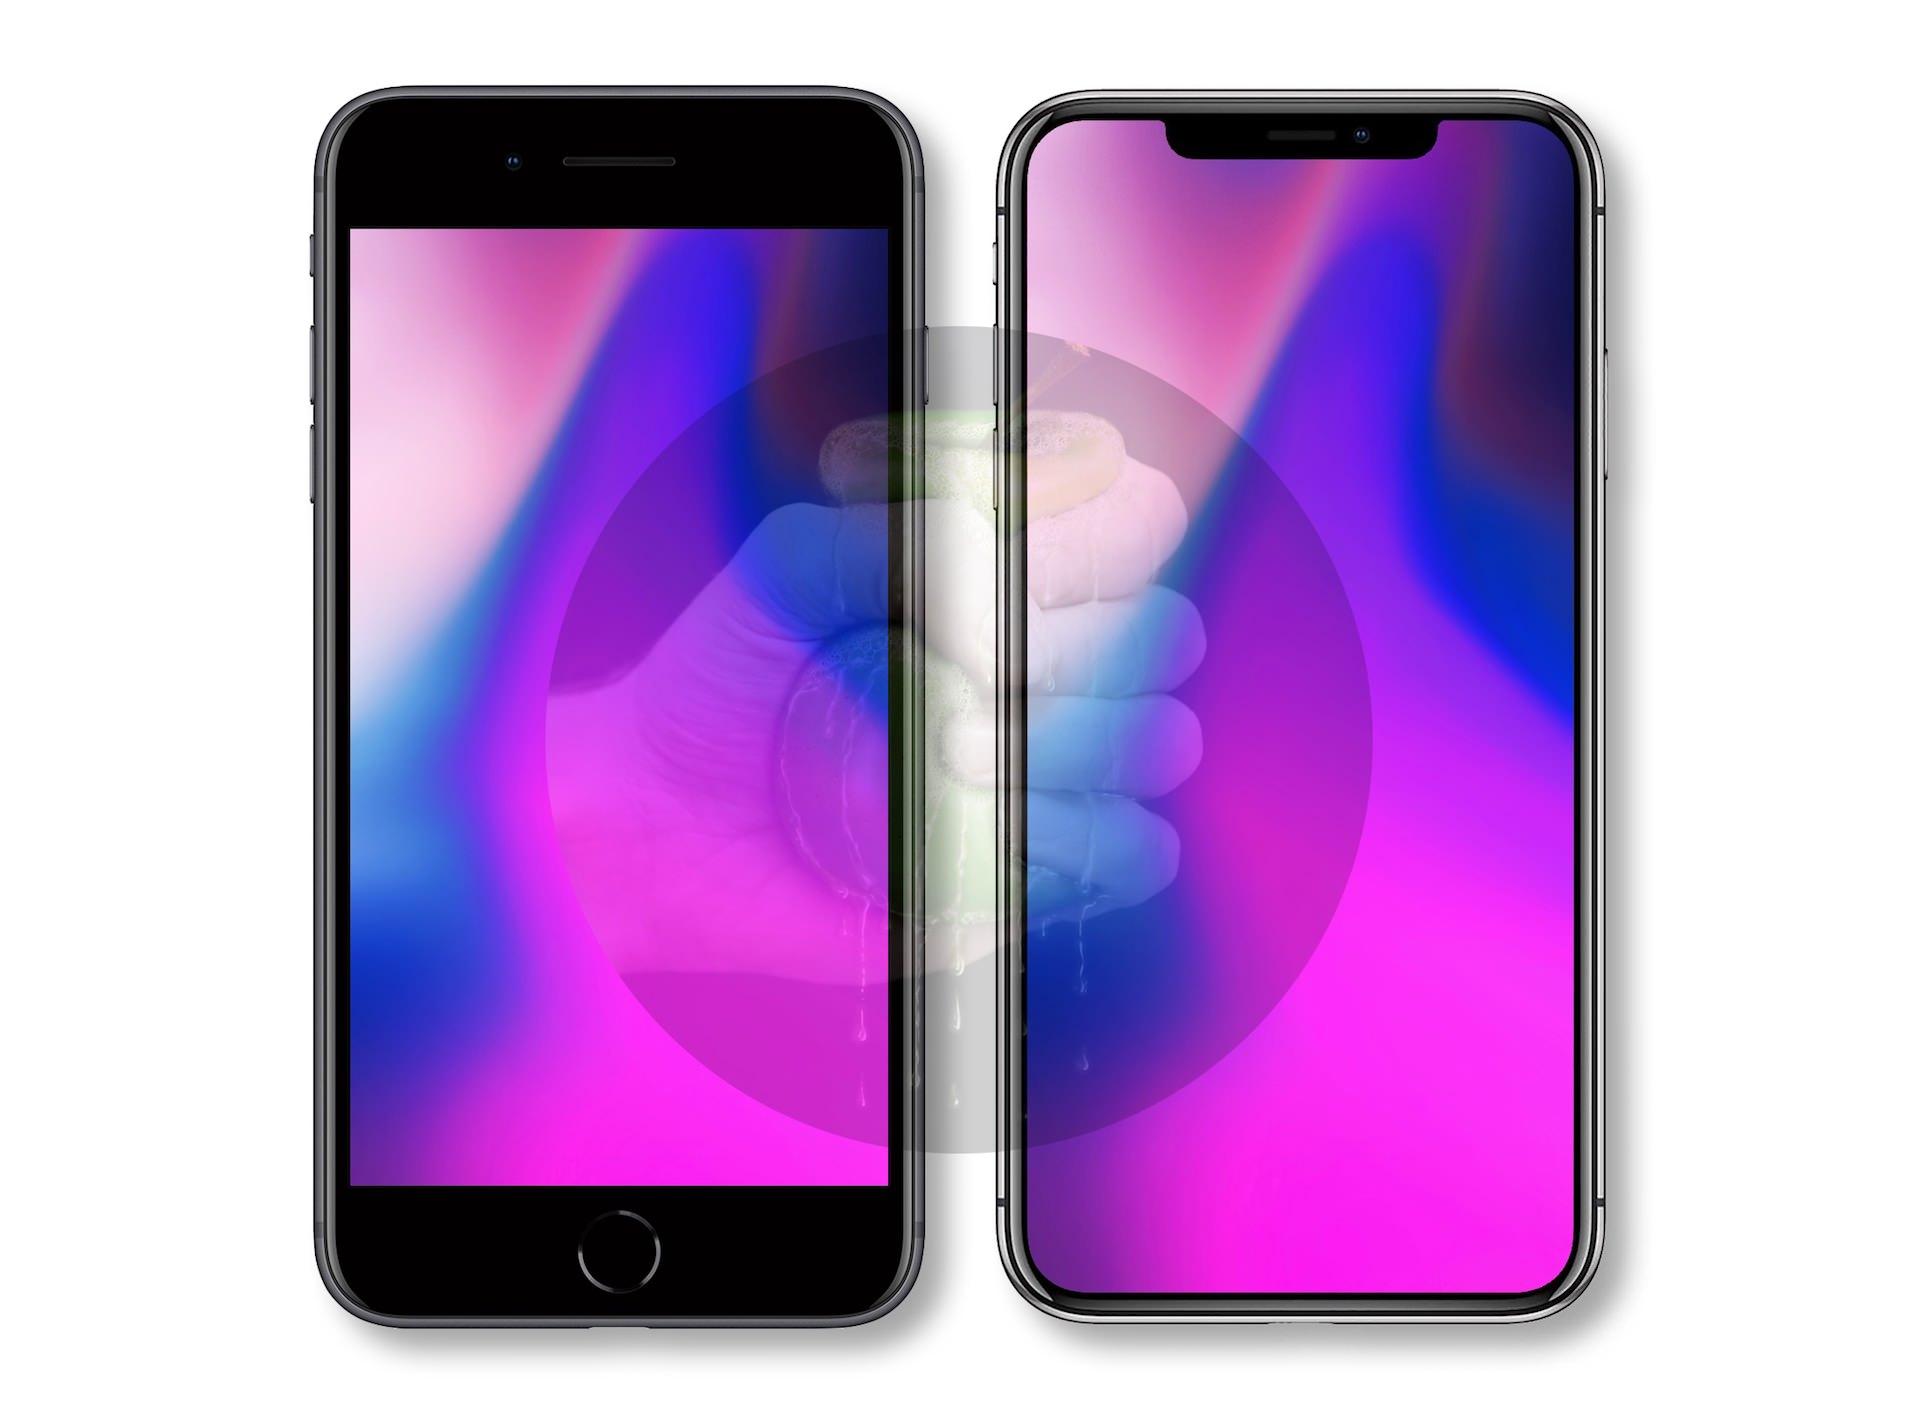 iPhone-9-wylsacom-16